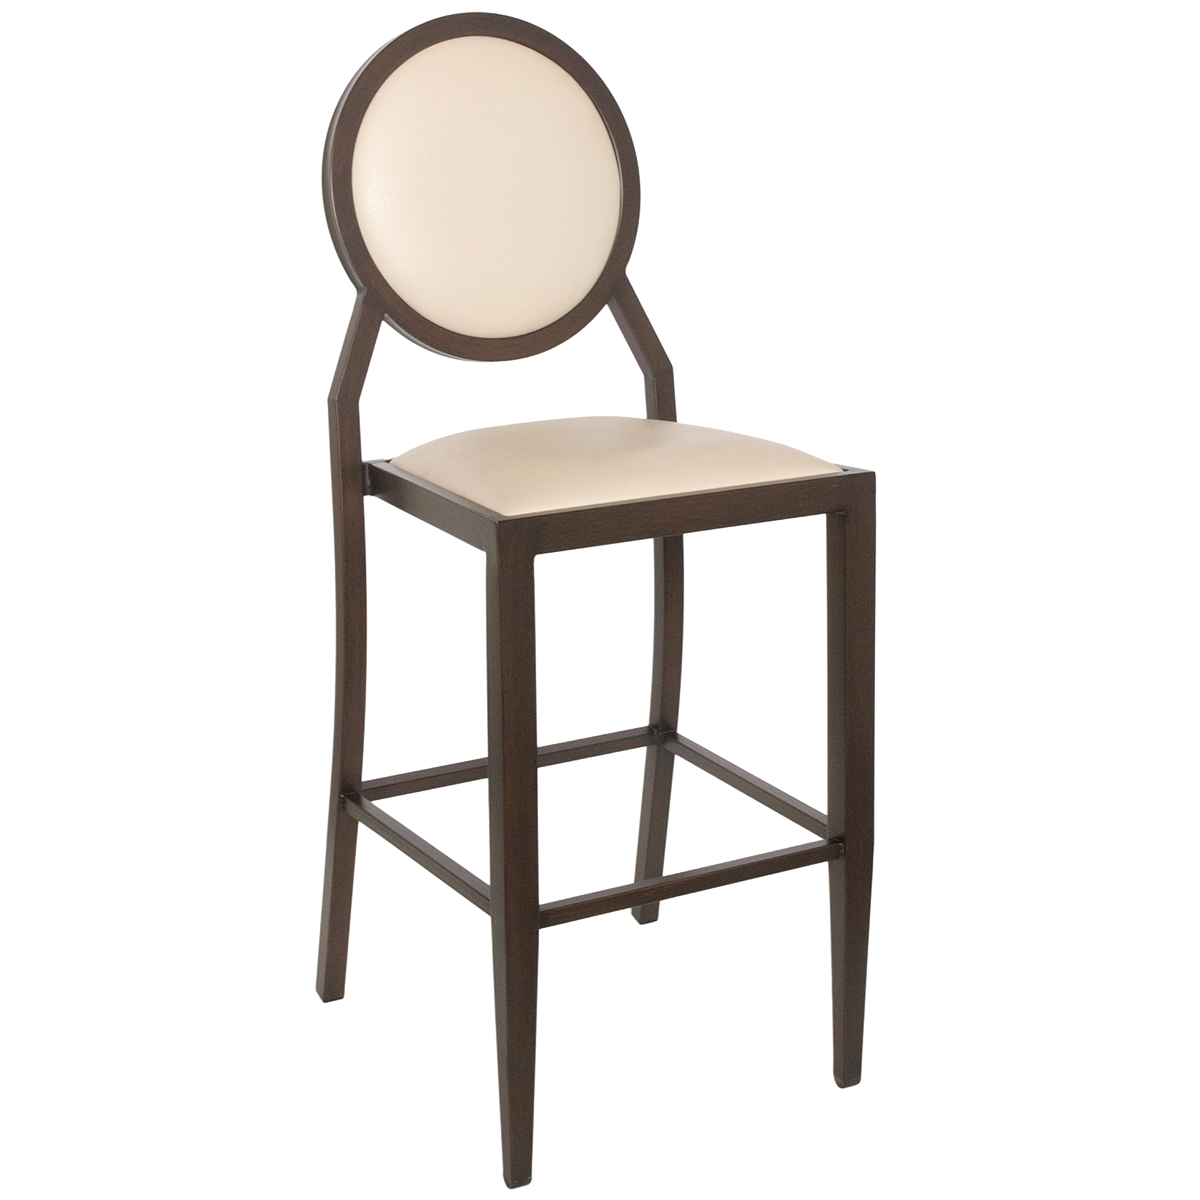 - Metal Barstools : Wood-Look Stacking Round Back Barstool